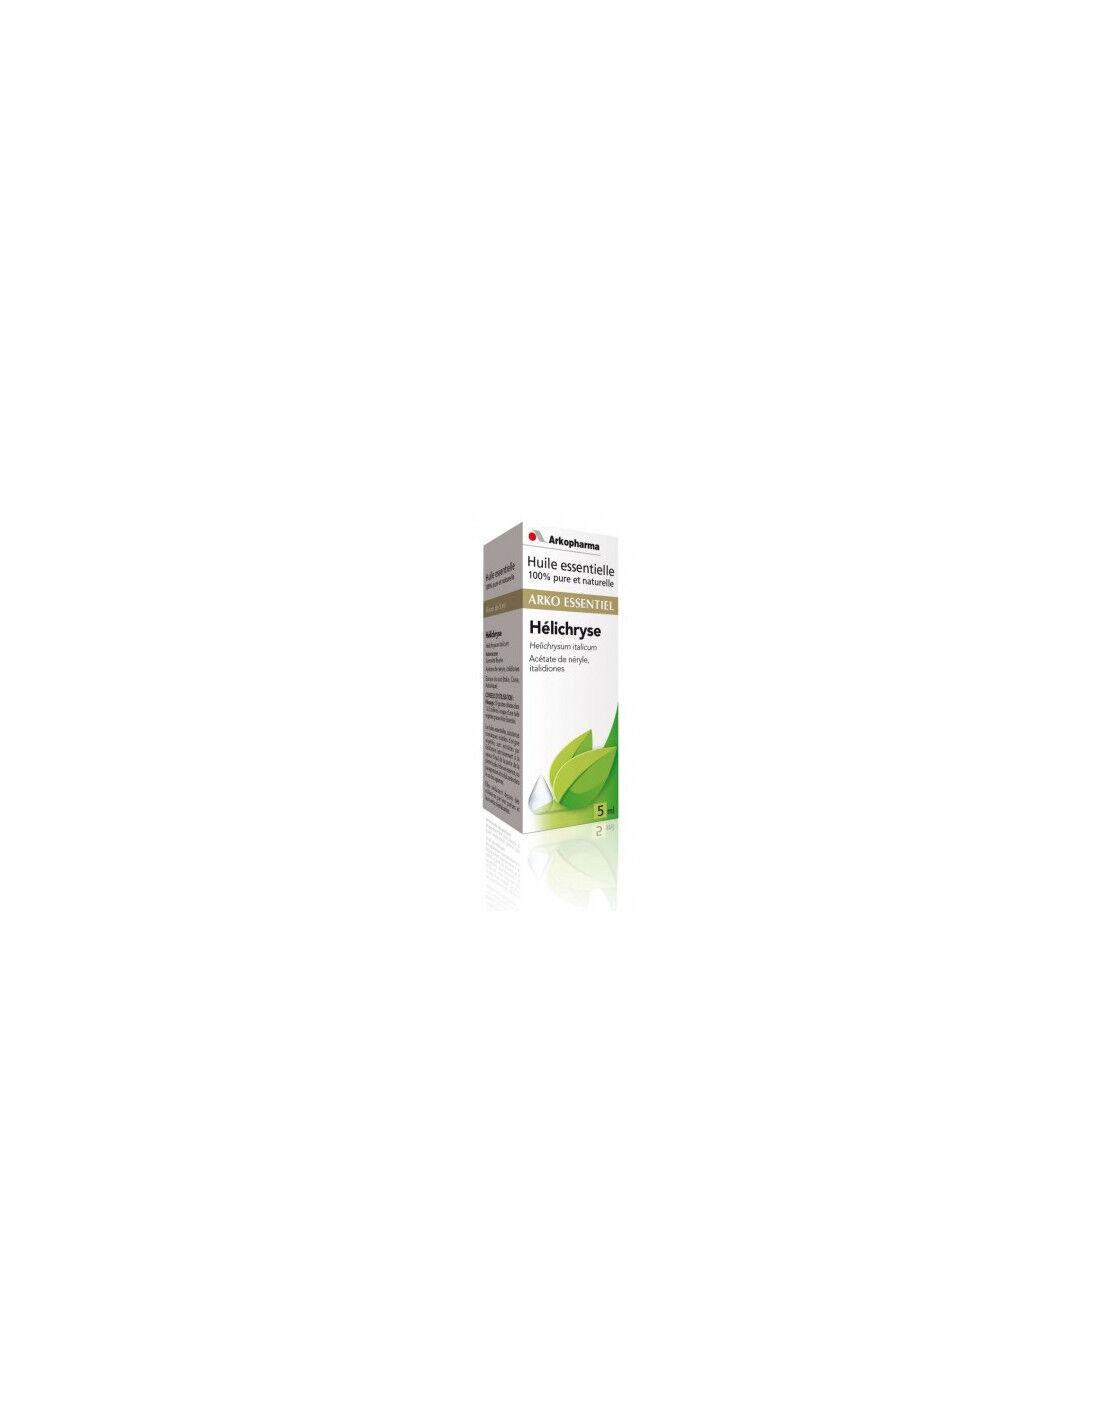 Arkopharma Arko Essentiel Huile Essentielle Hélichryse 5 ml